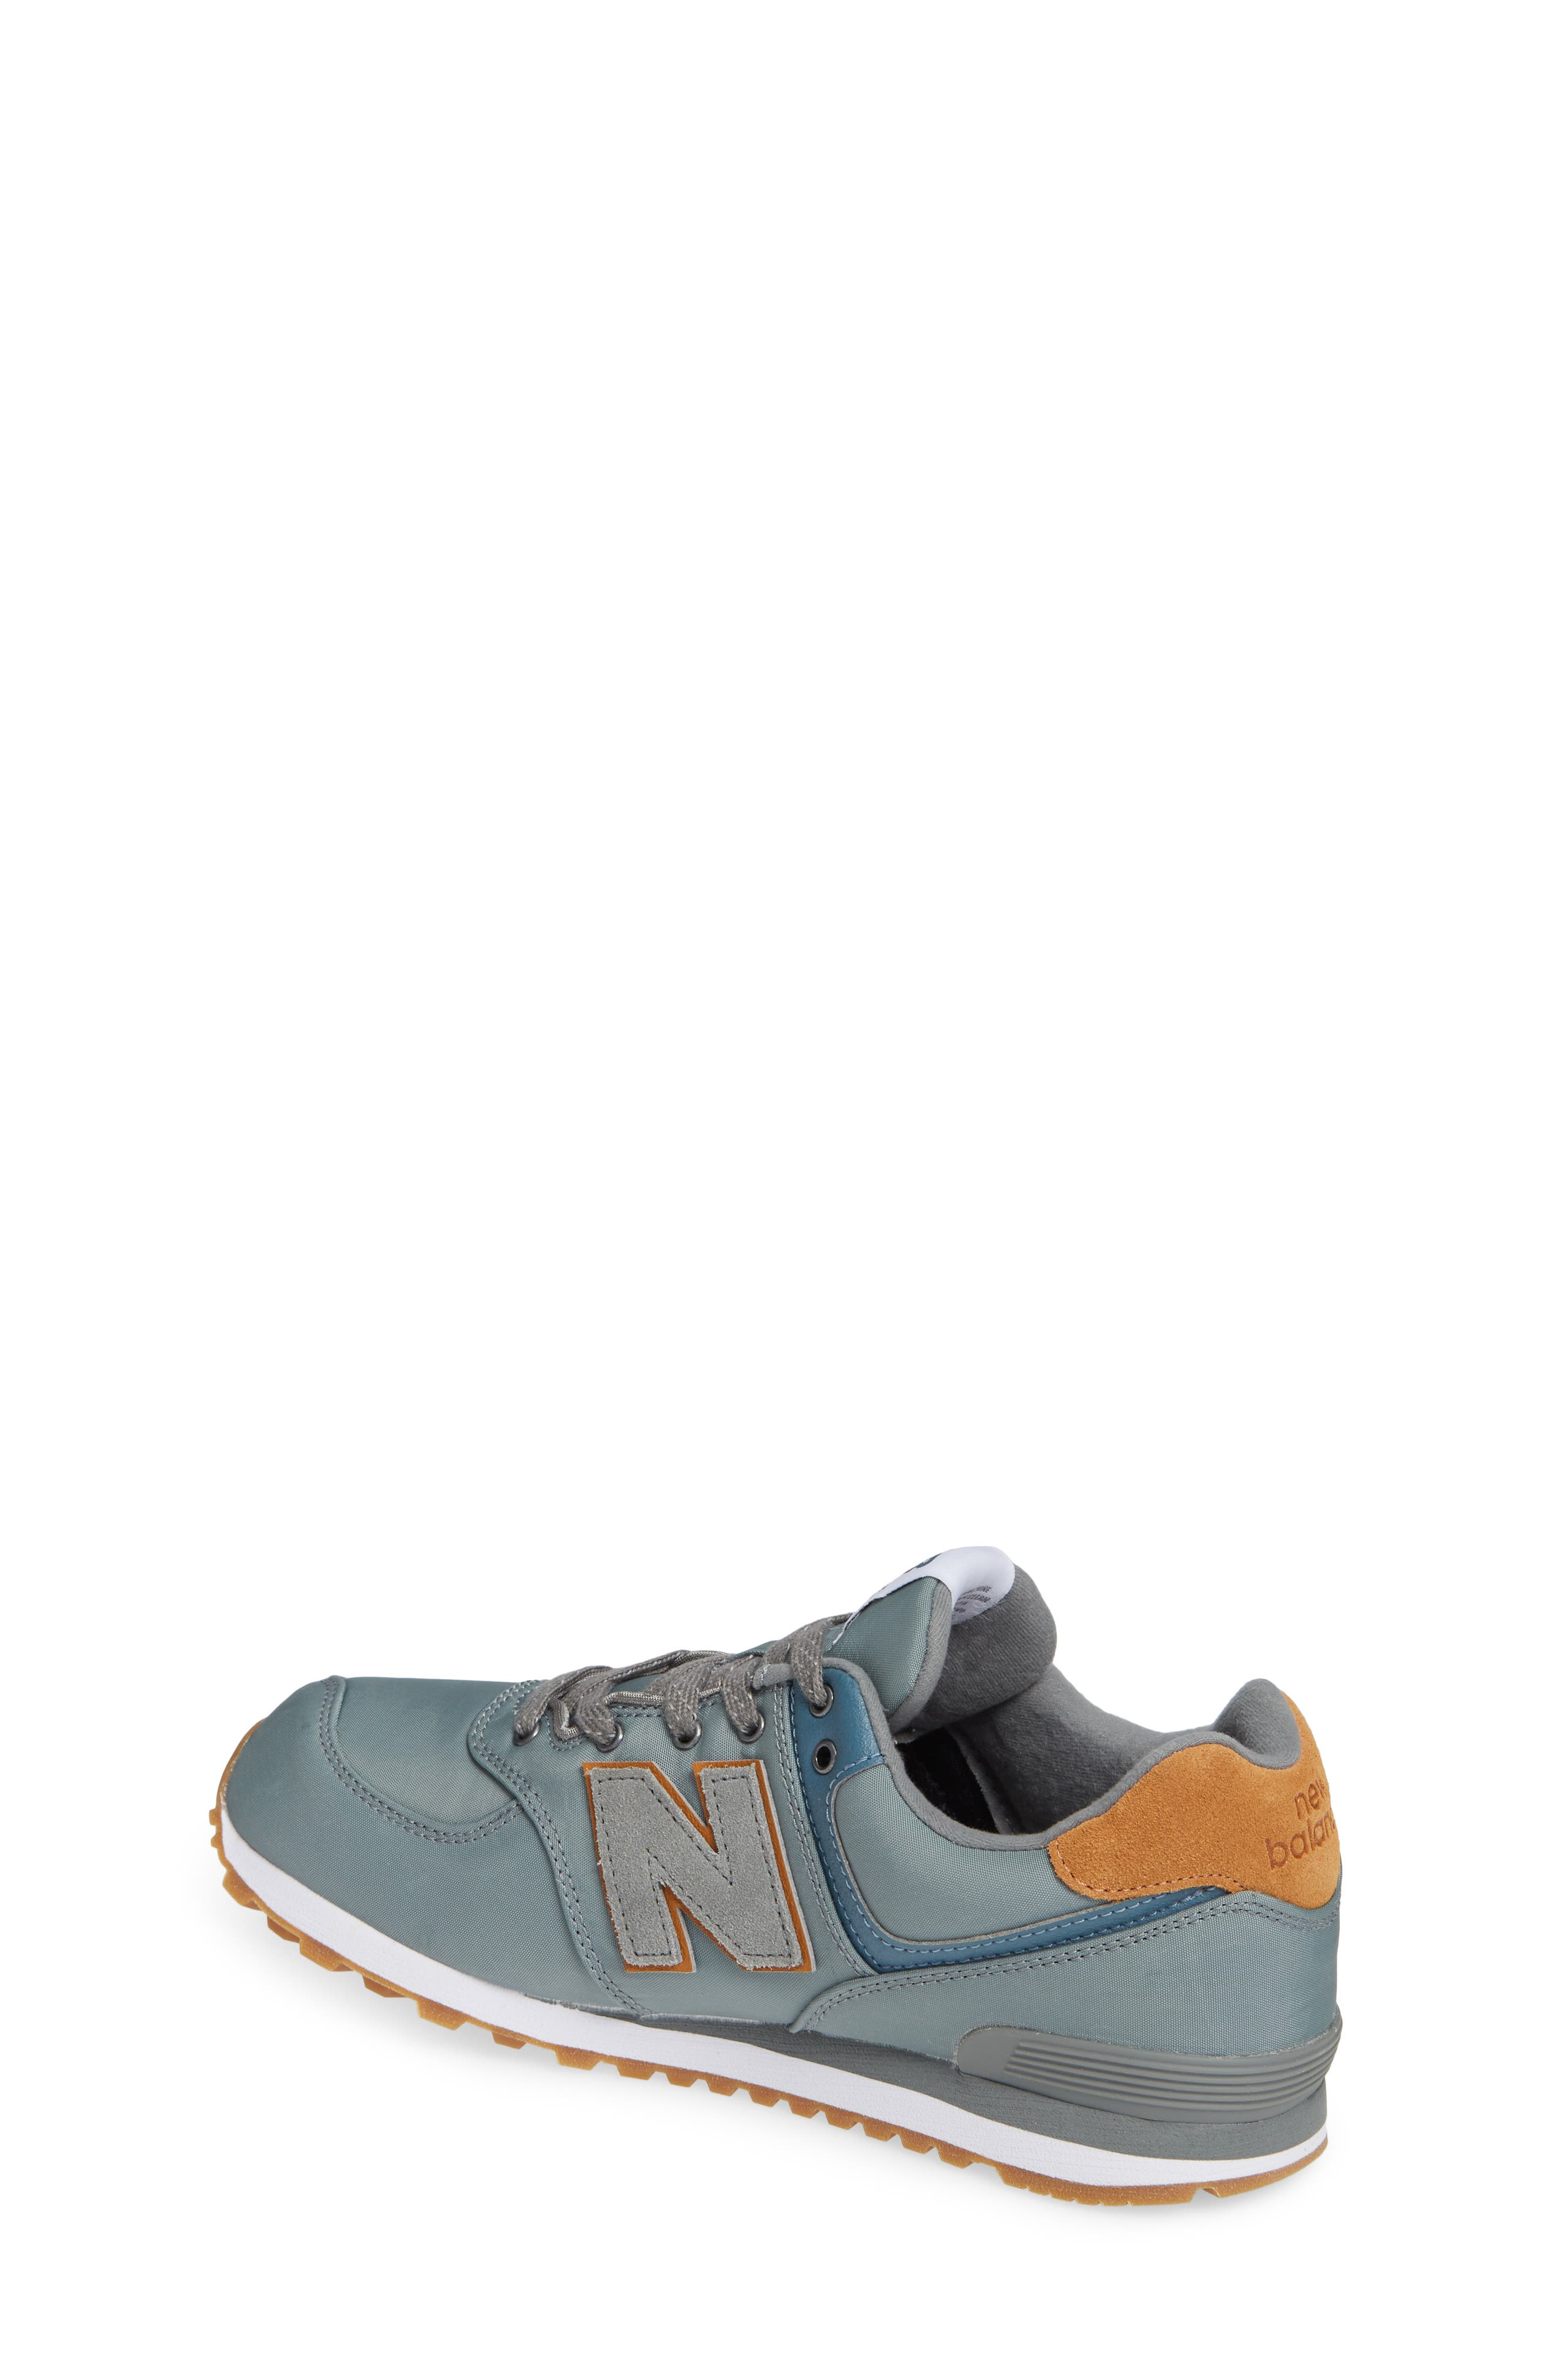 574 Essentials Sneaker,                             Alternate thumbnail 2, color,                             Sedona Sage